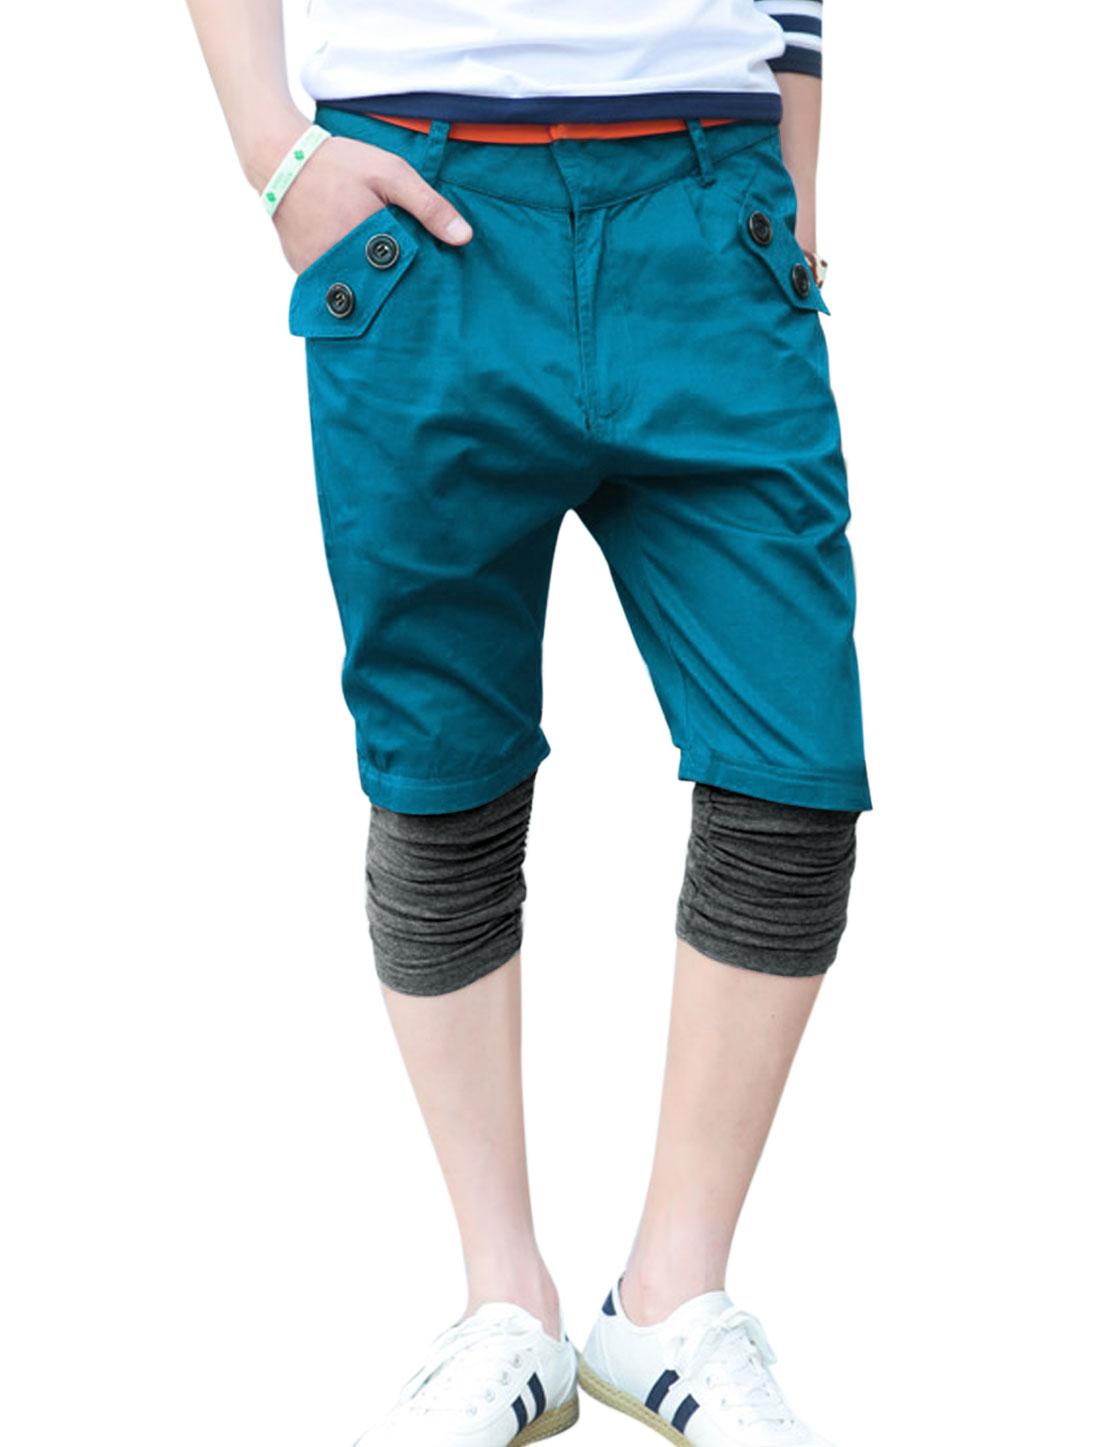 Men Zip Up Panel Design Shirred Cuffs Capris Pants Peacock Blue W30